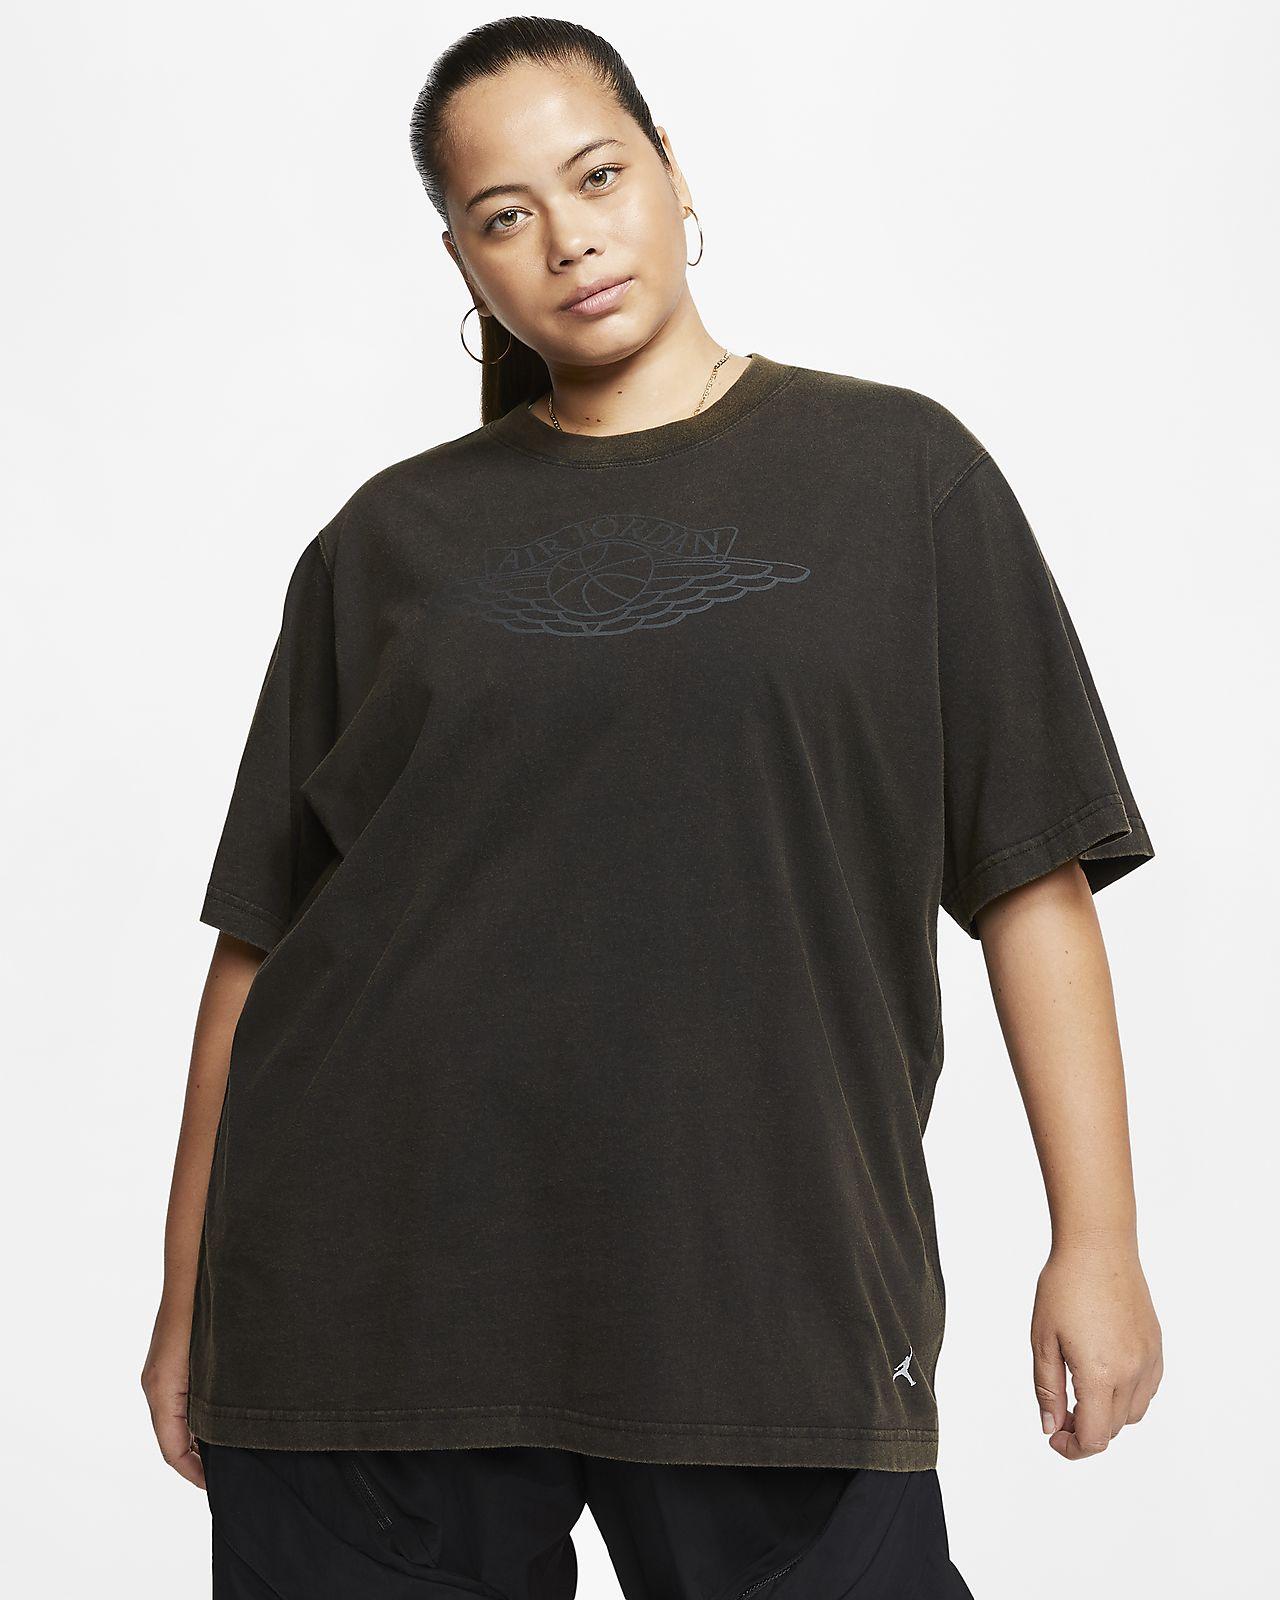 Jordan Women's Oversize T-Shirt